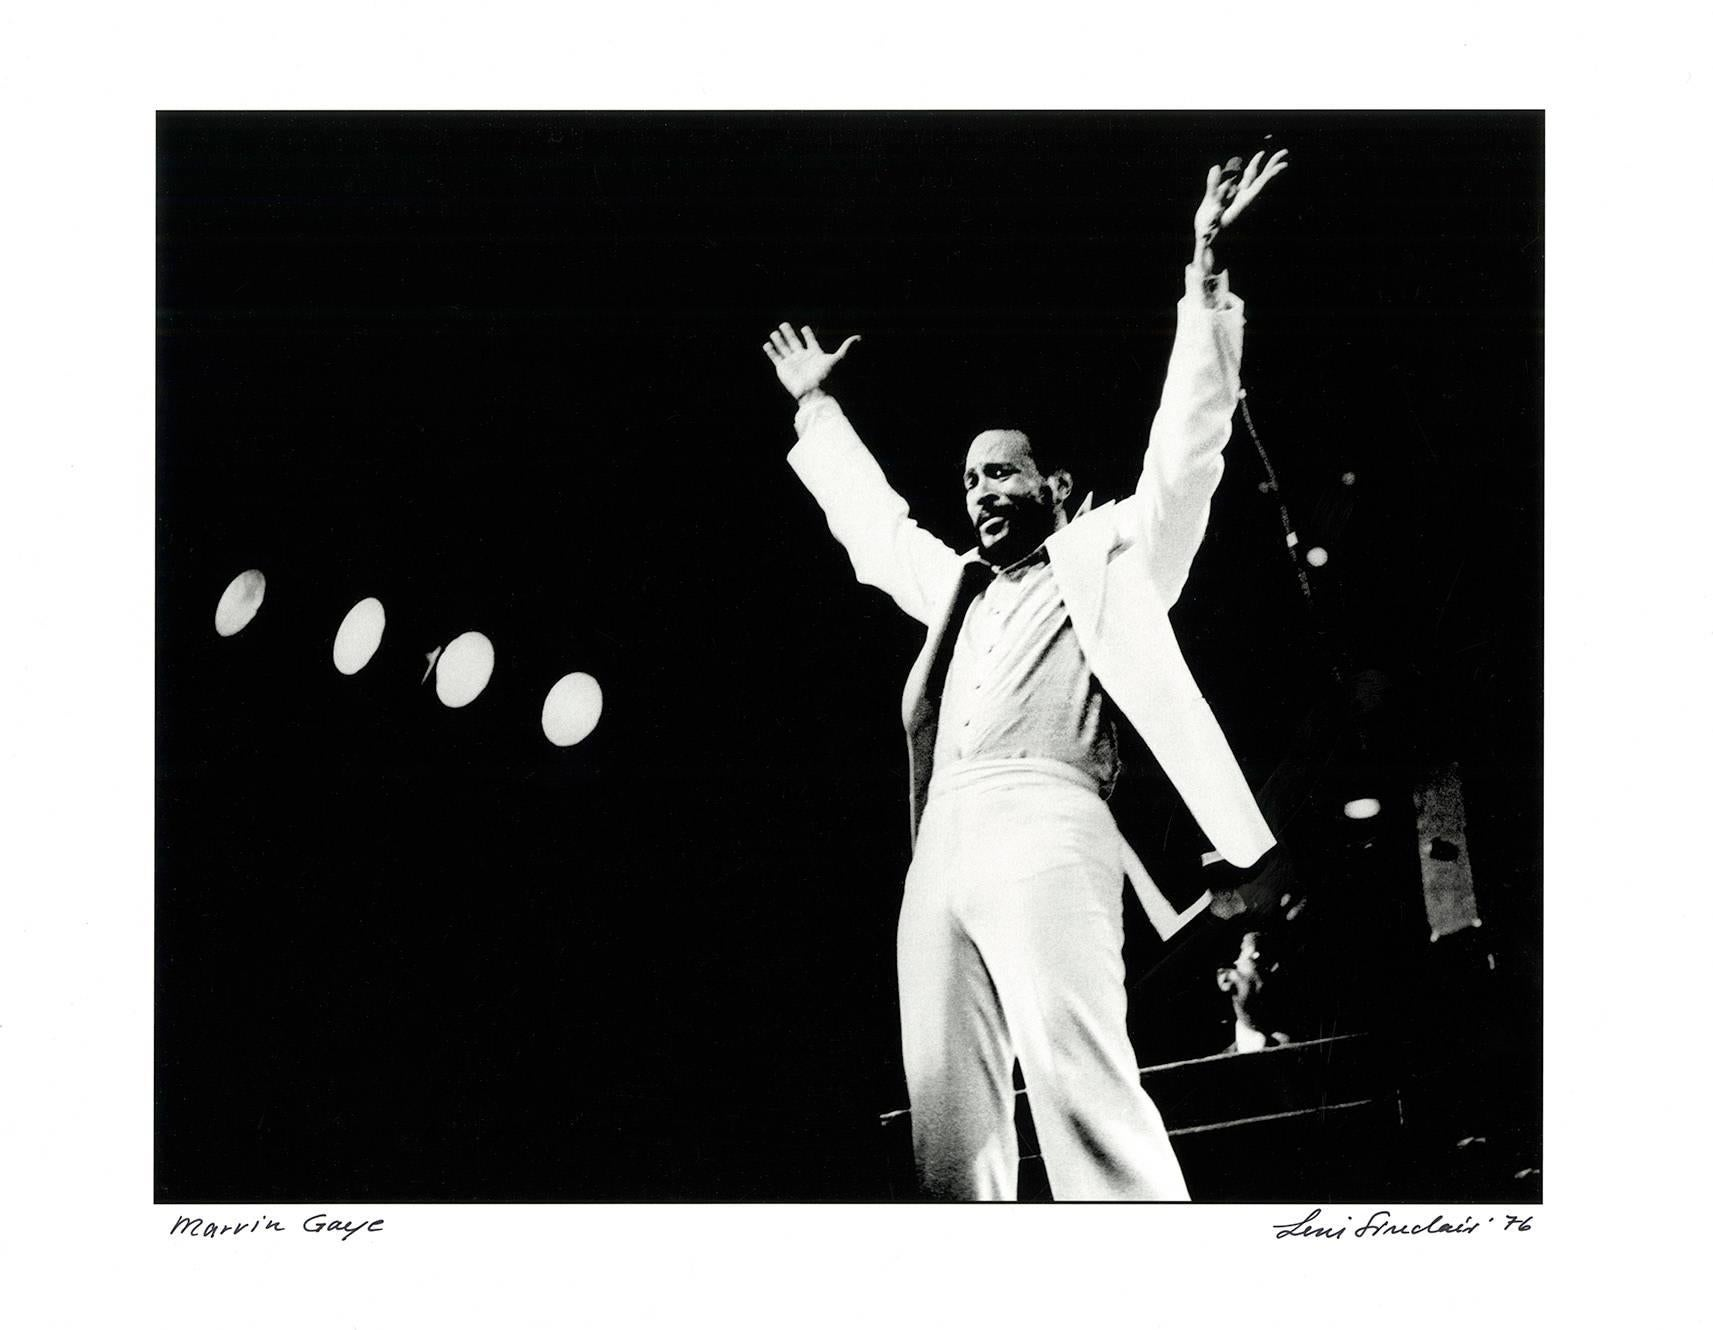 Marvin Gaye photograph, Detroit, 1976 (Motown)